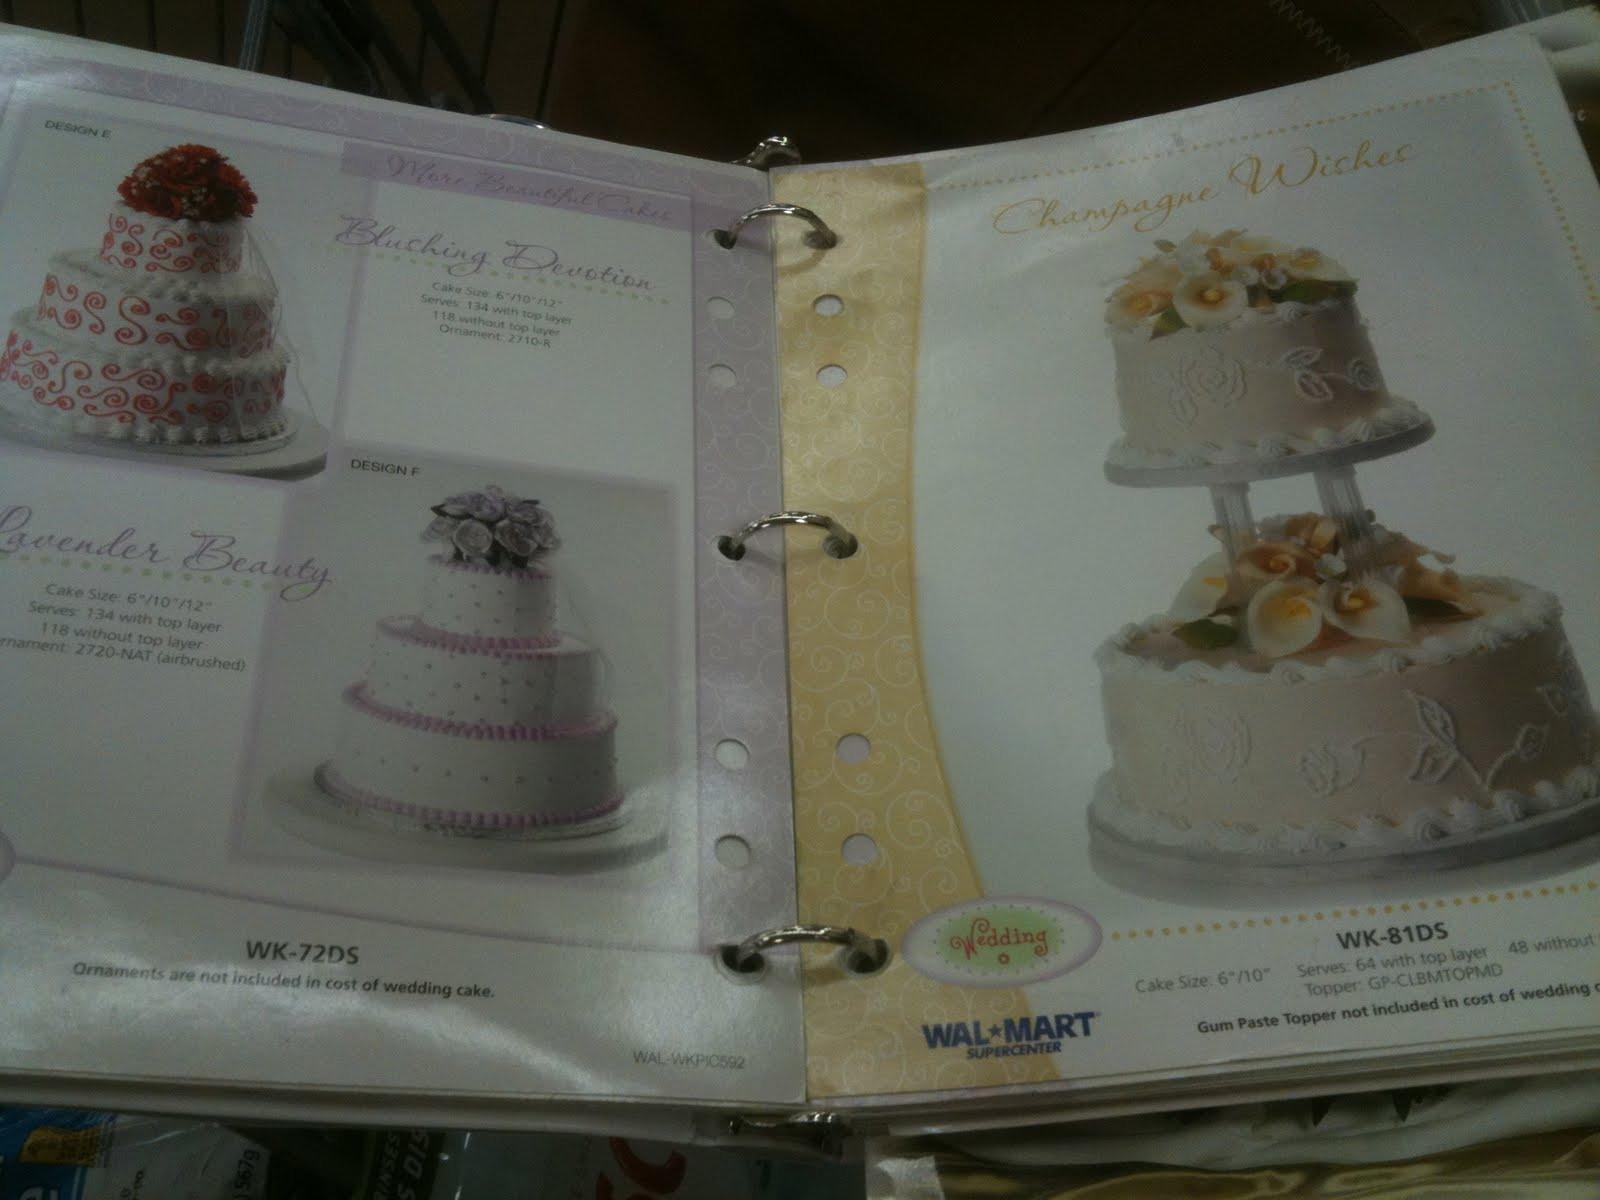 Walmart Wedding Cakes Cost  Walmart wedding cakes cost idea in 2017